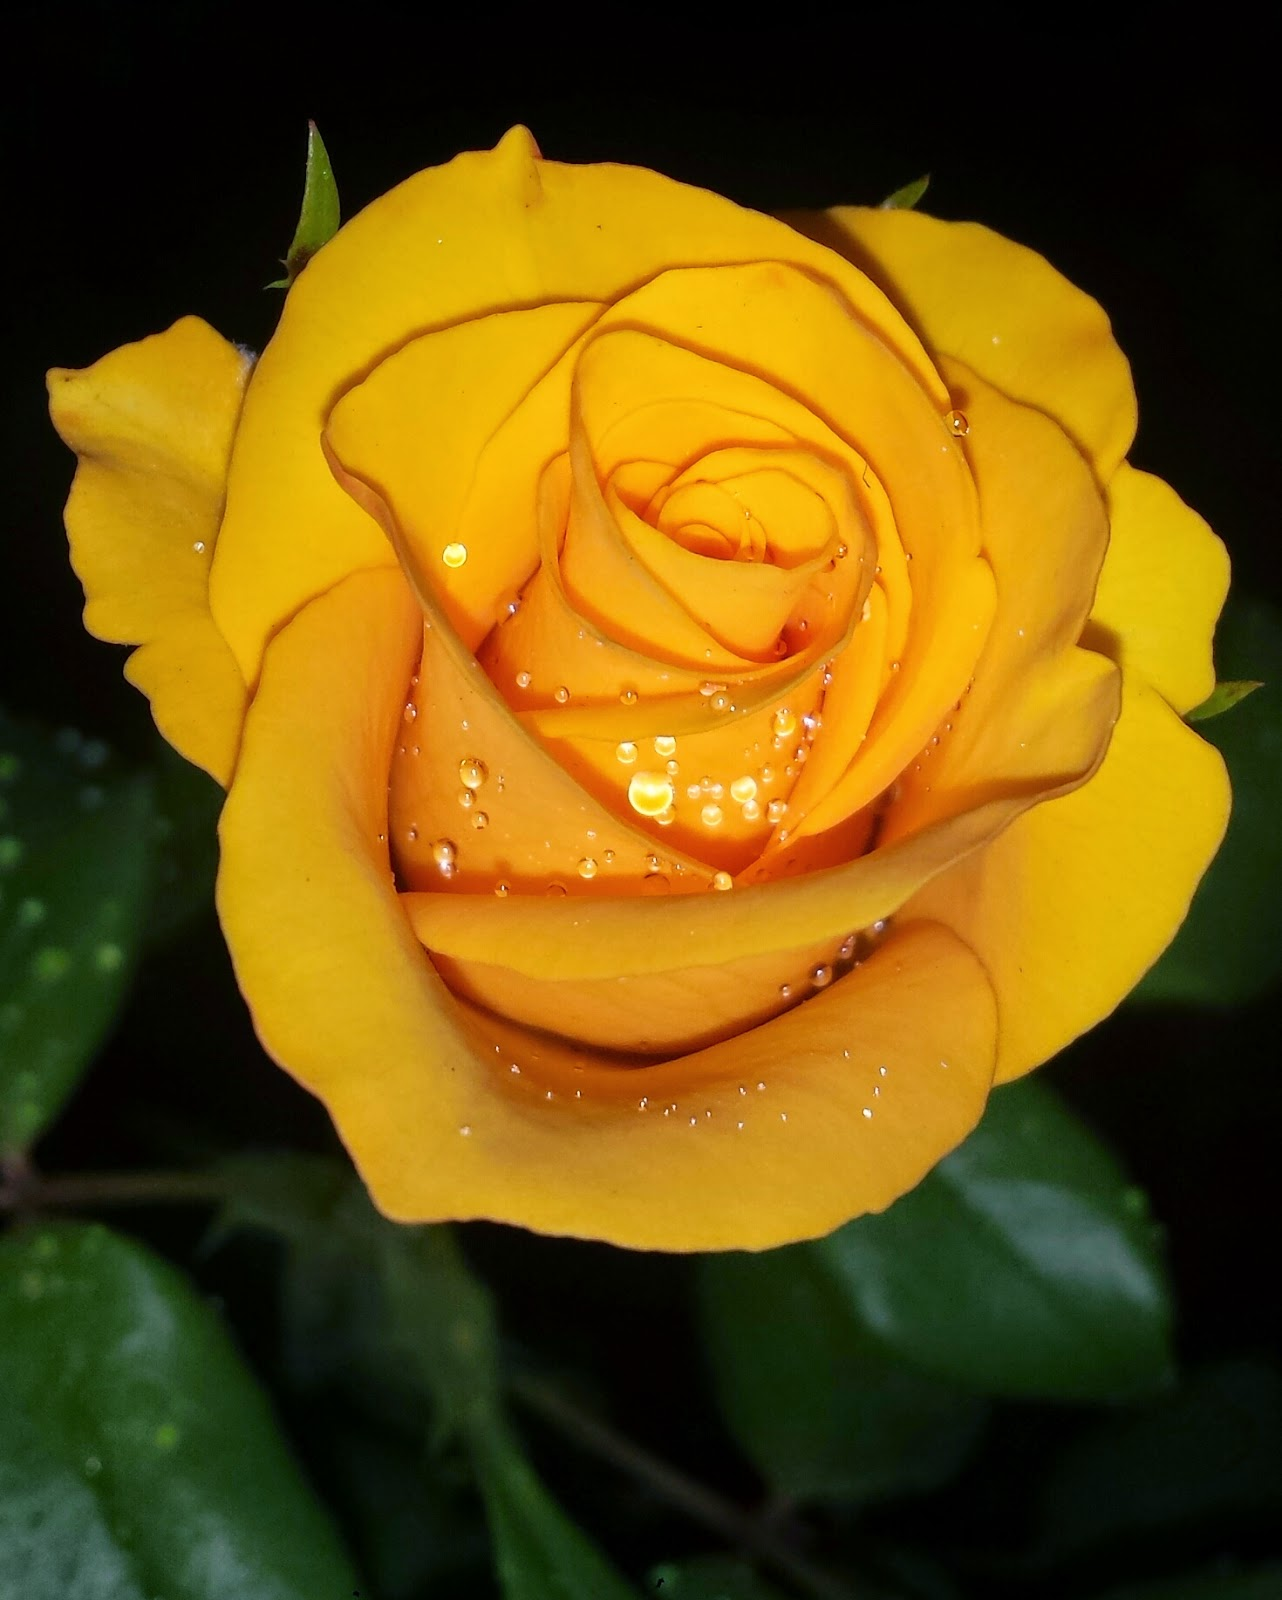 jardim rosas amarelas : jardim rosas amarelas:Rosas amarelas